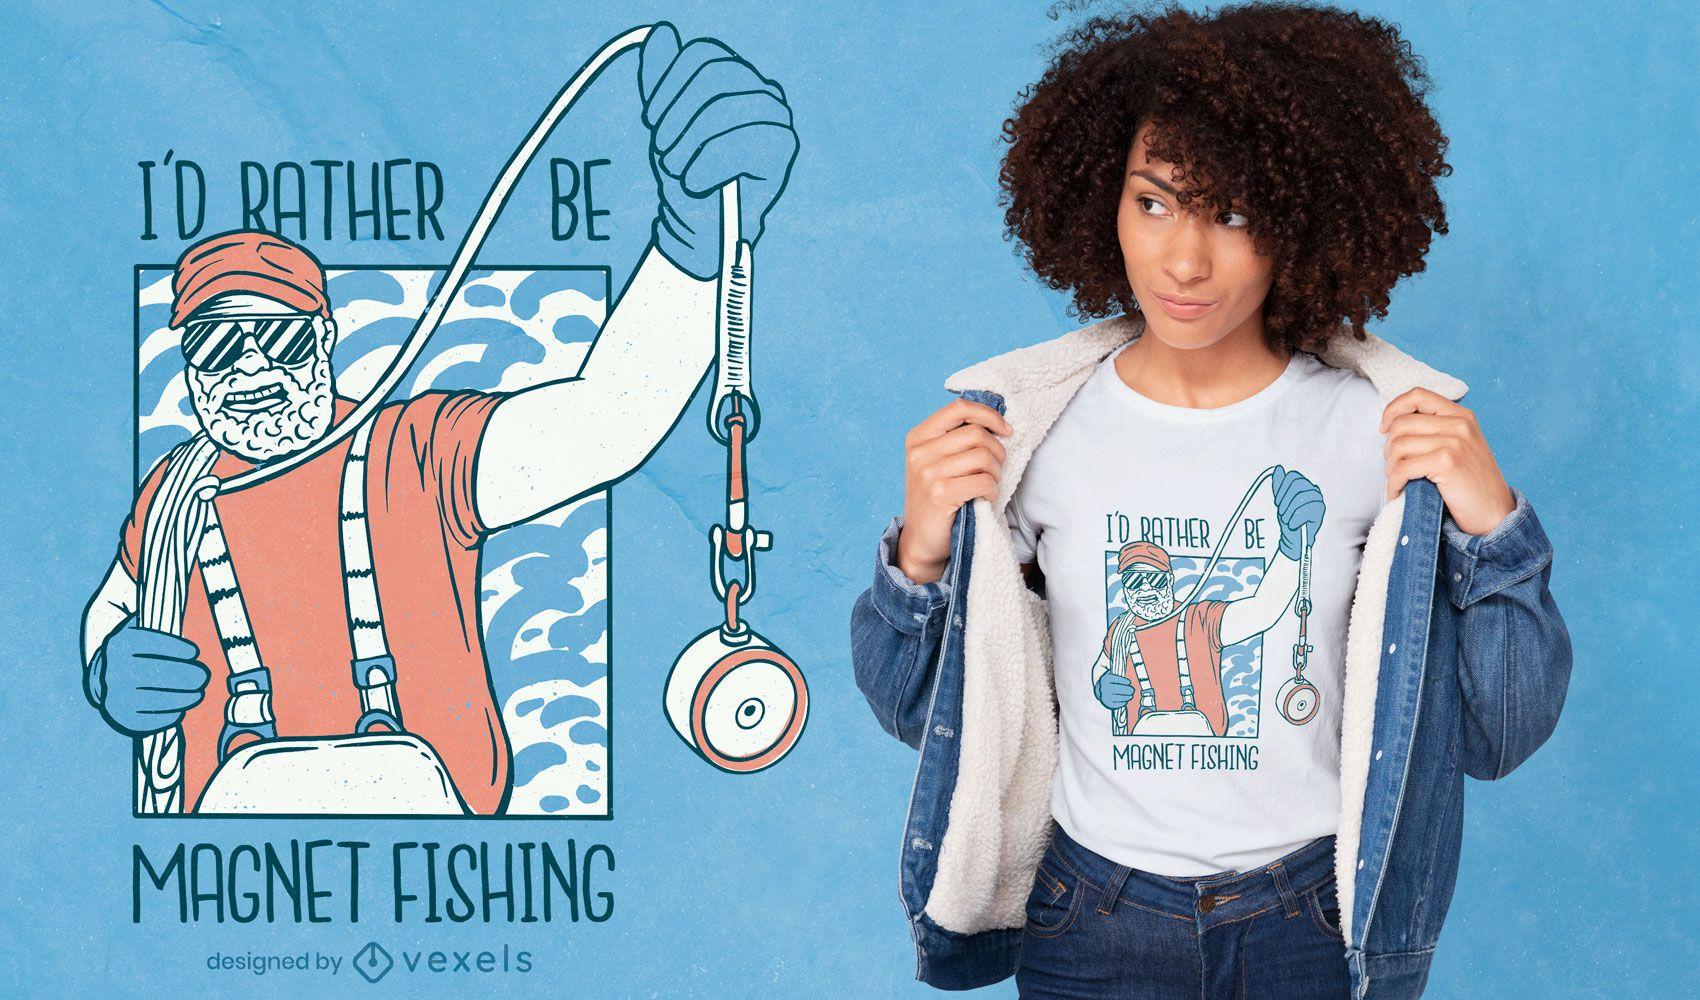 Magnet fishing t-shirt design